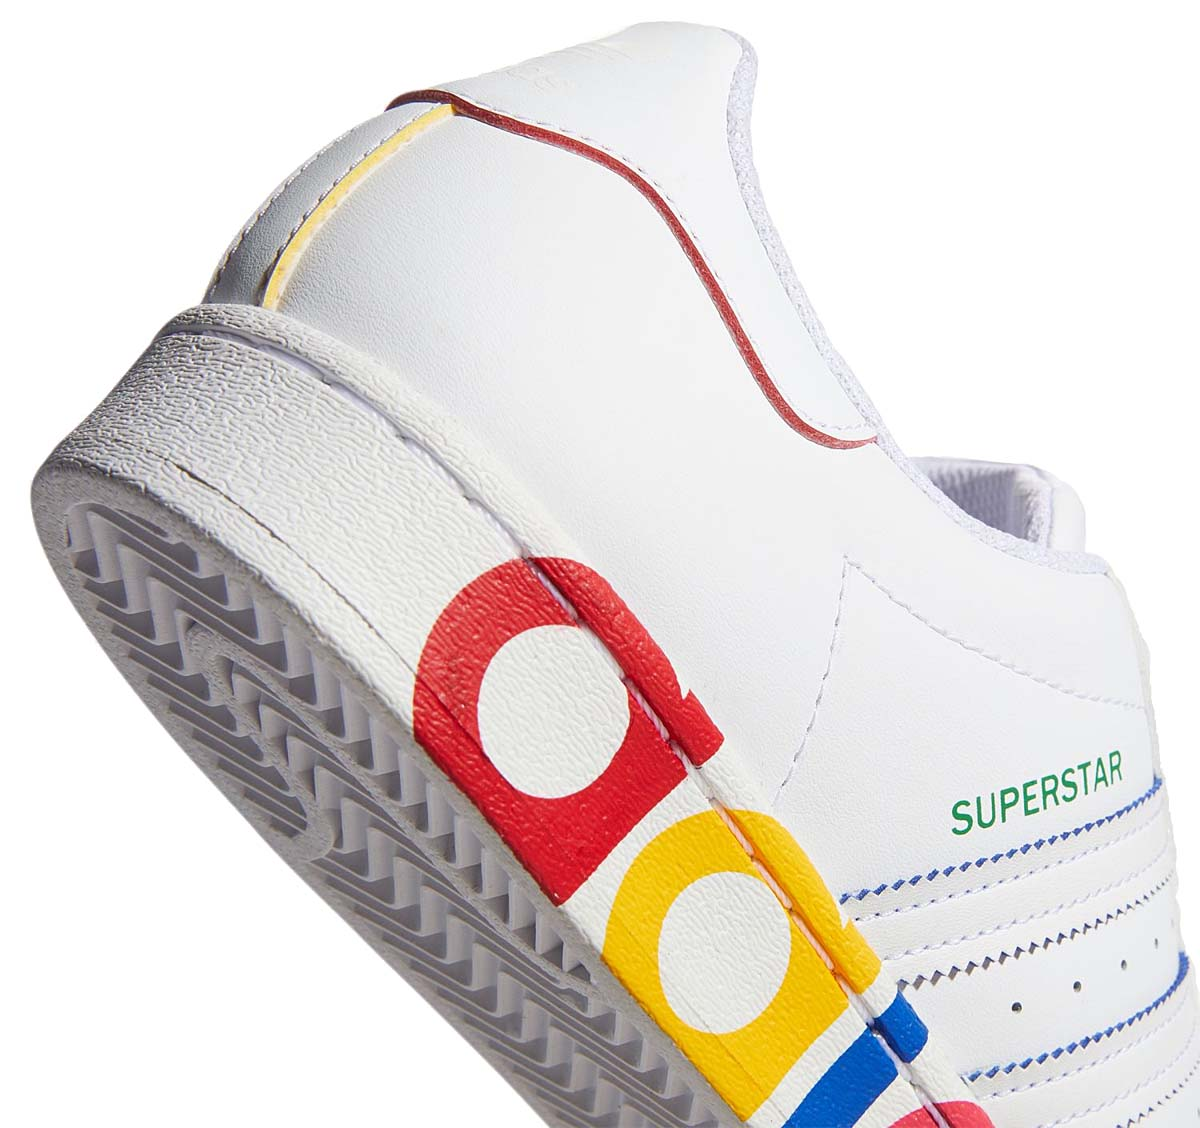 adidas Originals SUPERSTAR OLYMPIC FOOTWEAR WHITE / FOOTWEAR WHITE / TEAM ROYAL FY1147 アディダス オリジナルス スーパースター オリンピック フットウェアホワイト/フットウェアホワイト/チームロイヤルブルー